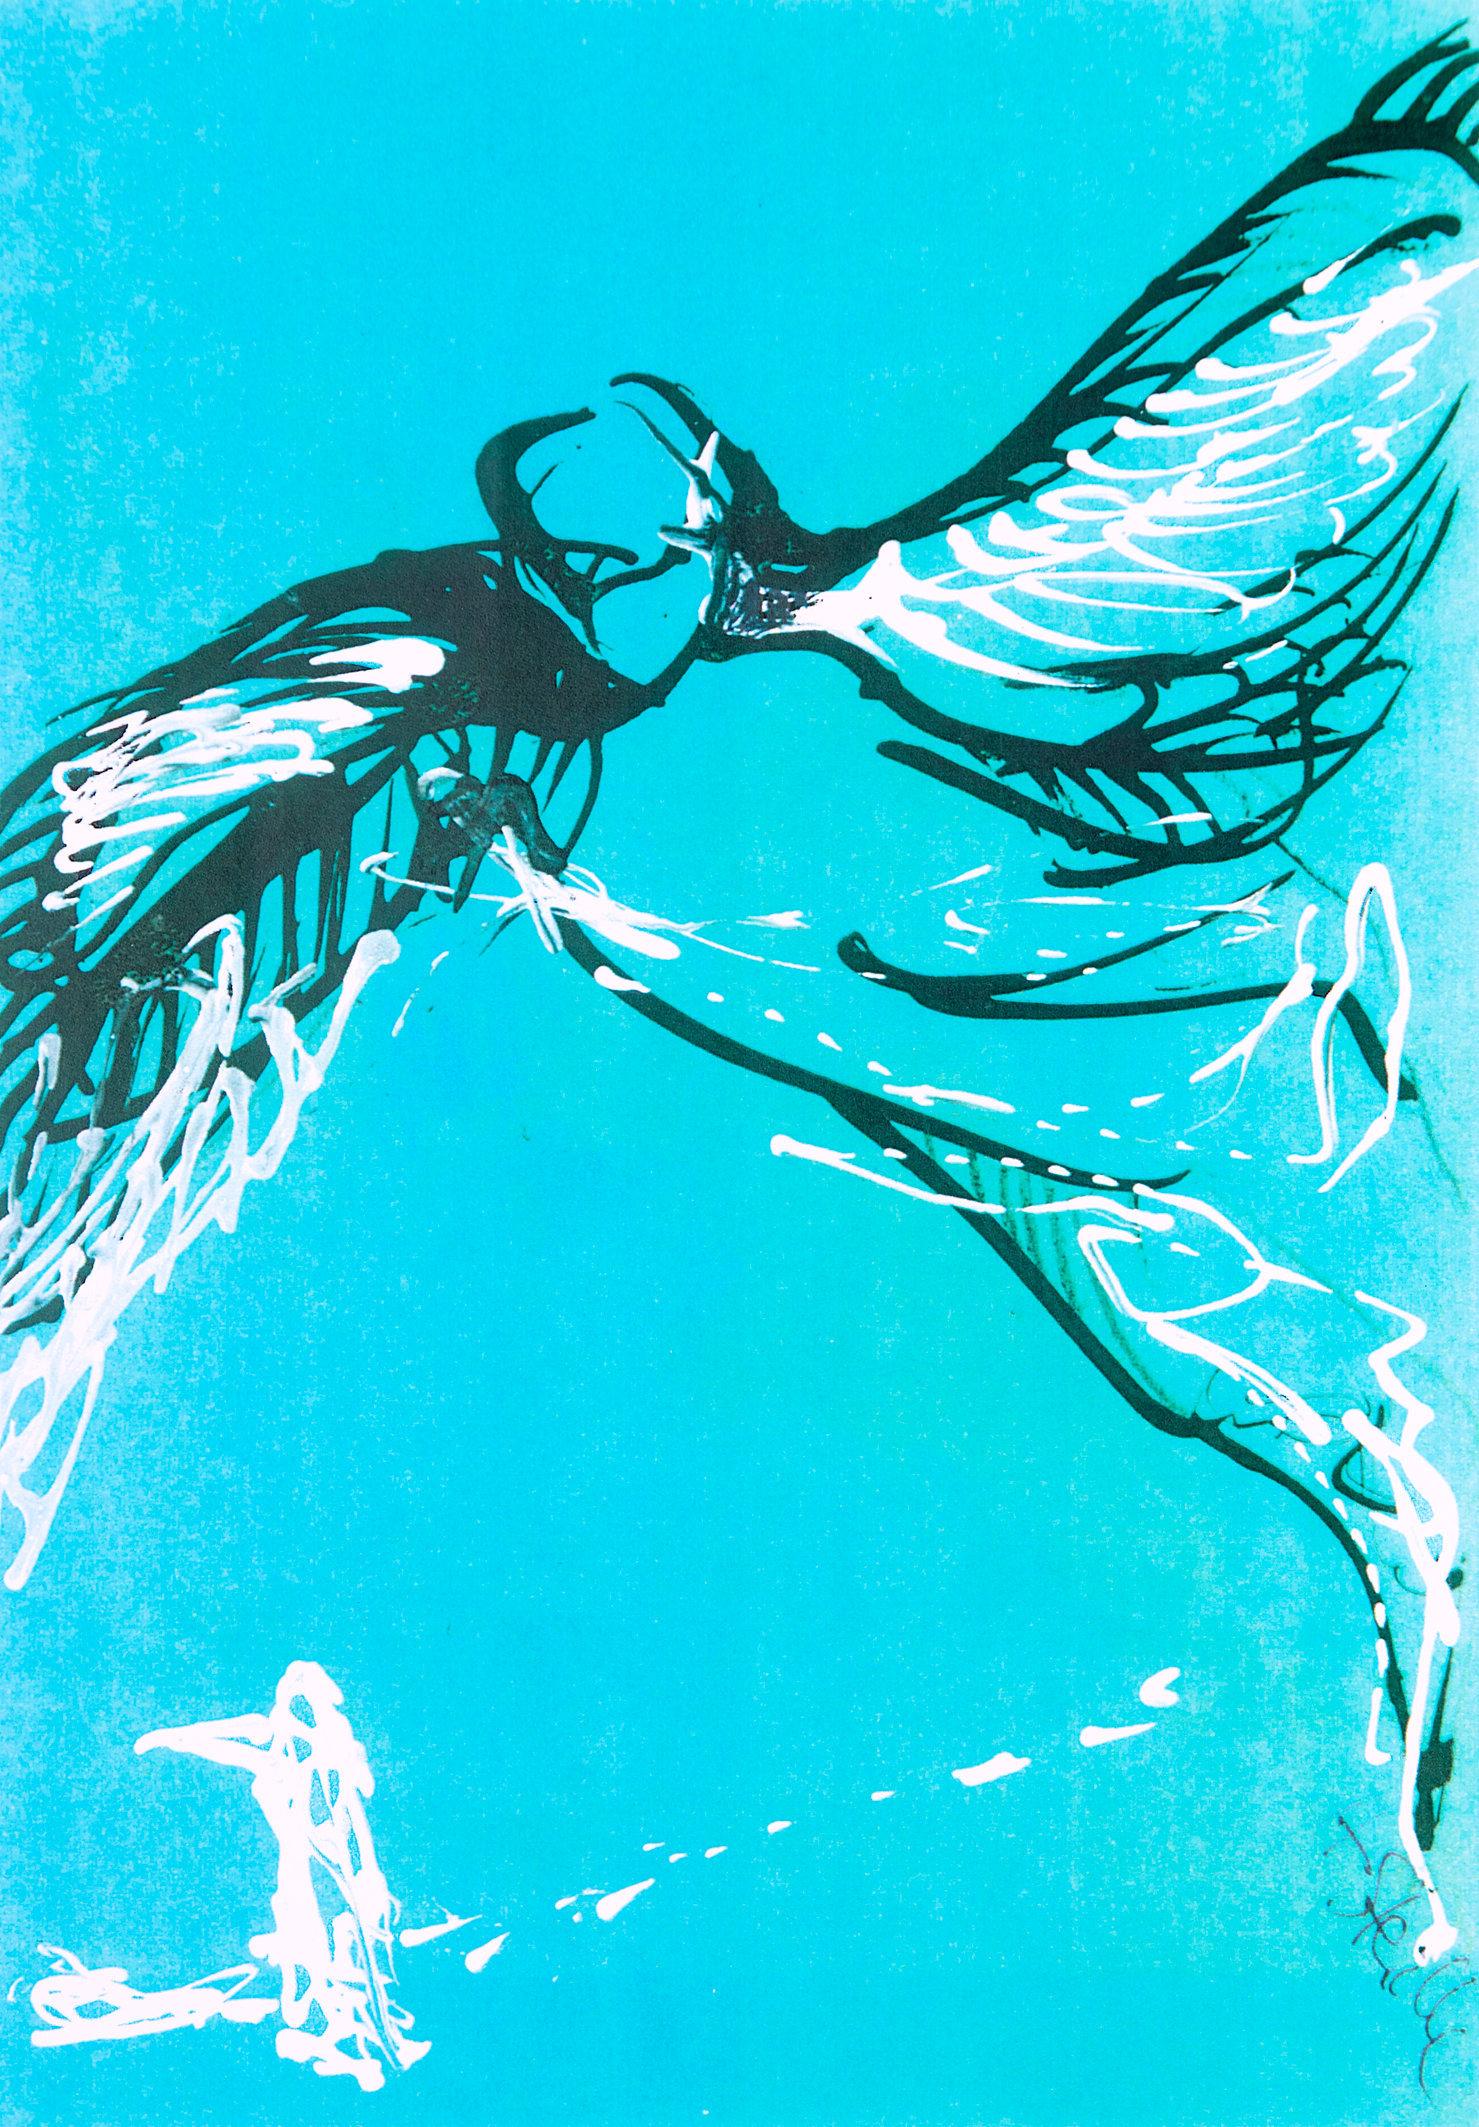 Der Engel Gottes rief Hagar